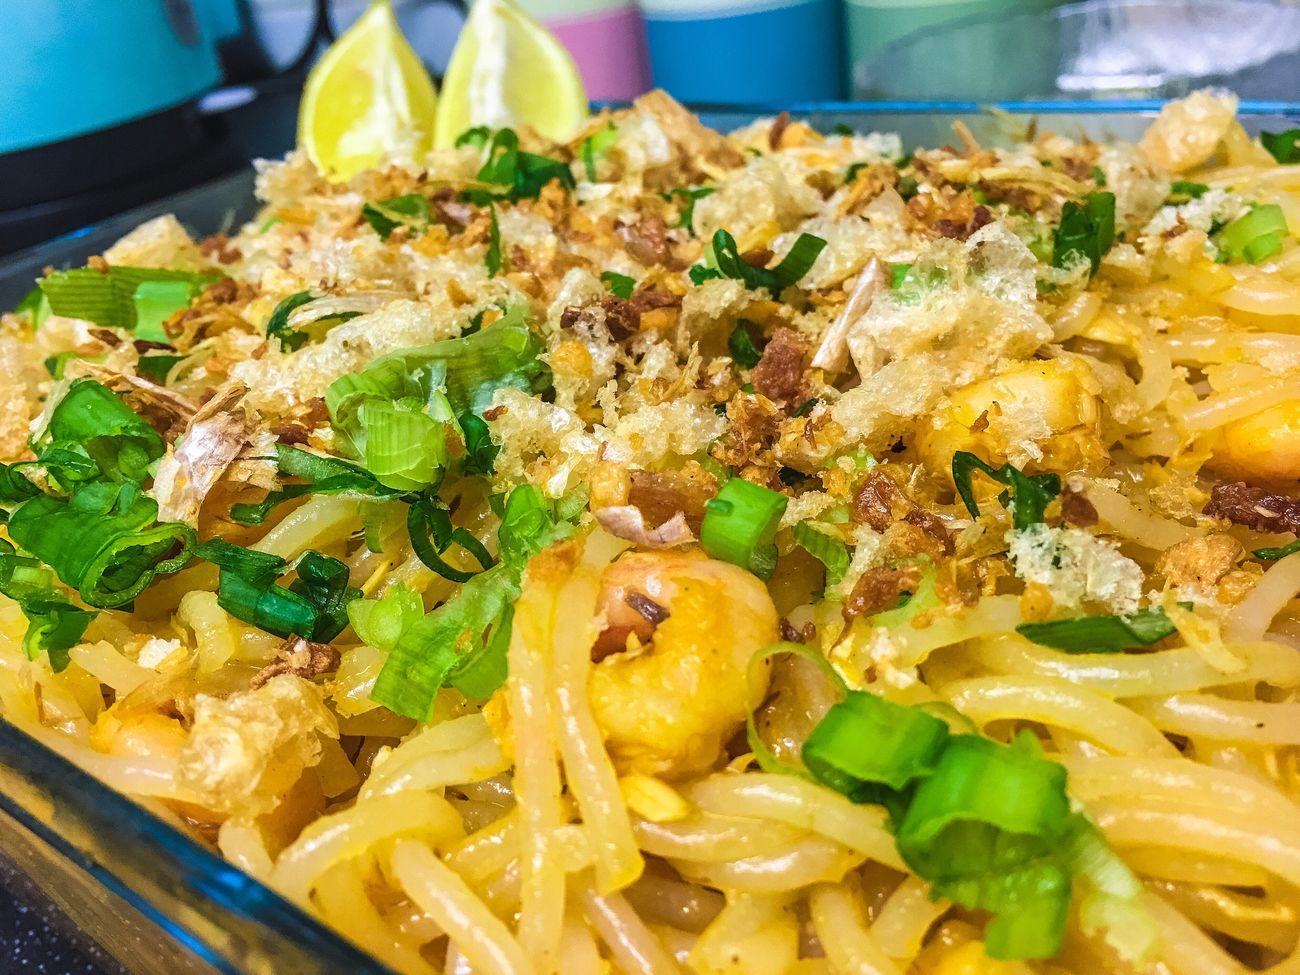 Dinner Filipinodish Pancitpalabok Homemade Homecooking Noodles Tgif Prawns Flaked Mackerel Friedgarlic Porkcrackling Springonions Lemon Yummy Iphonephotography